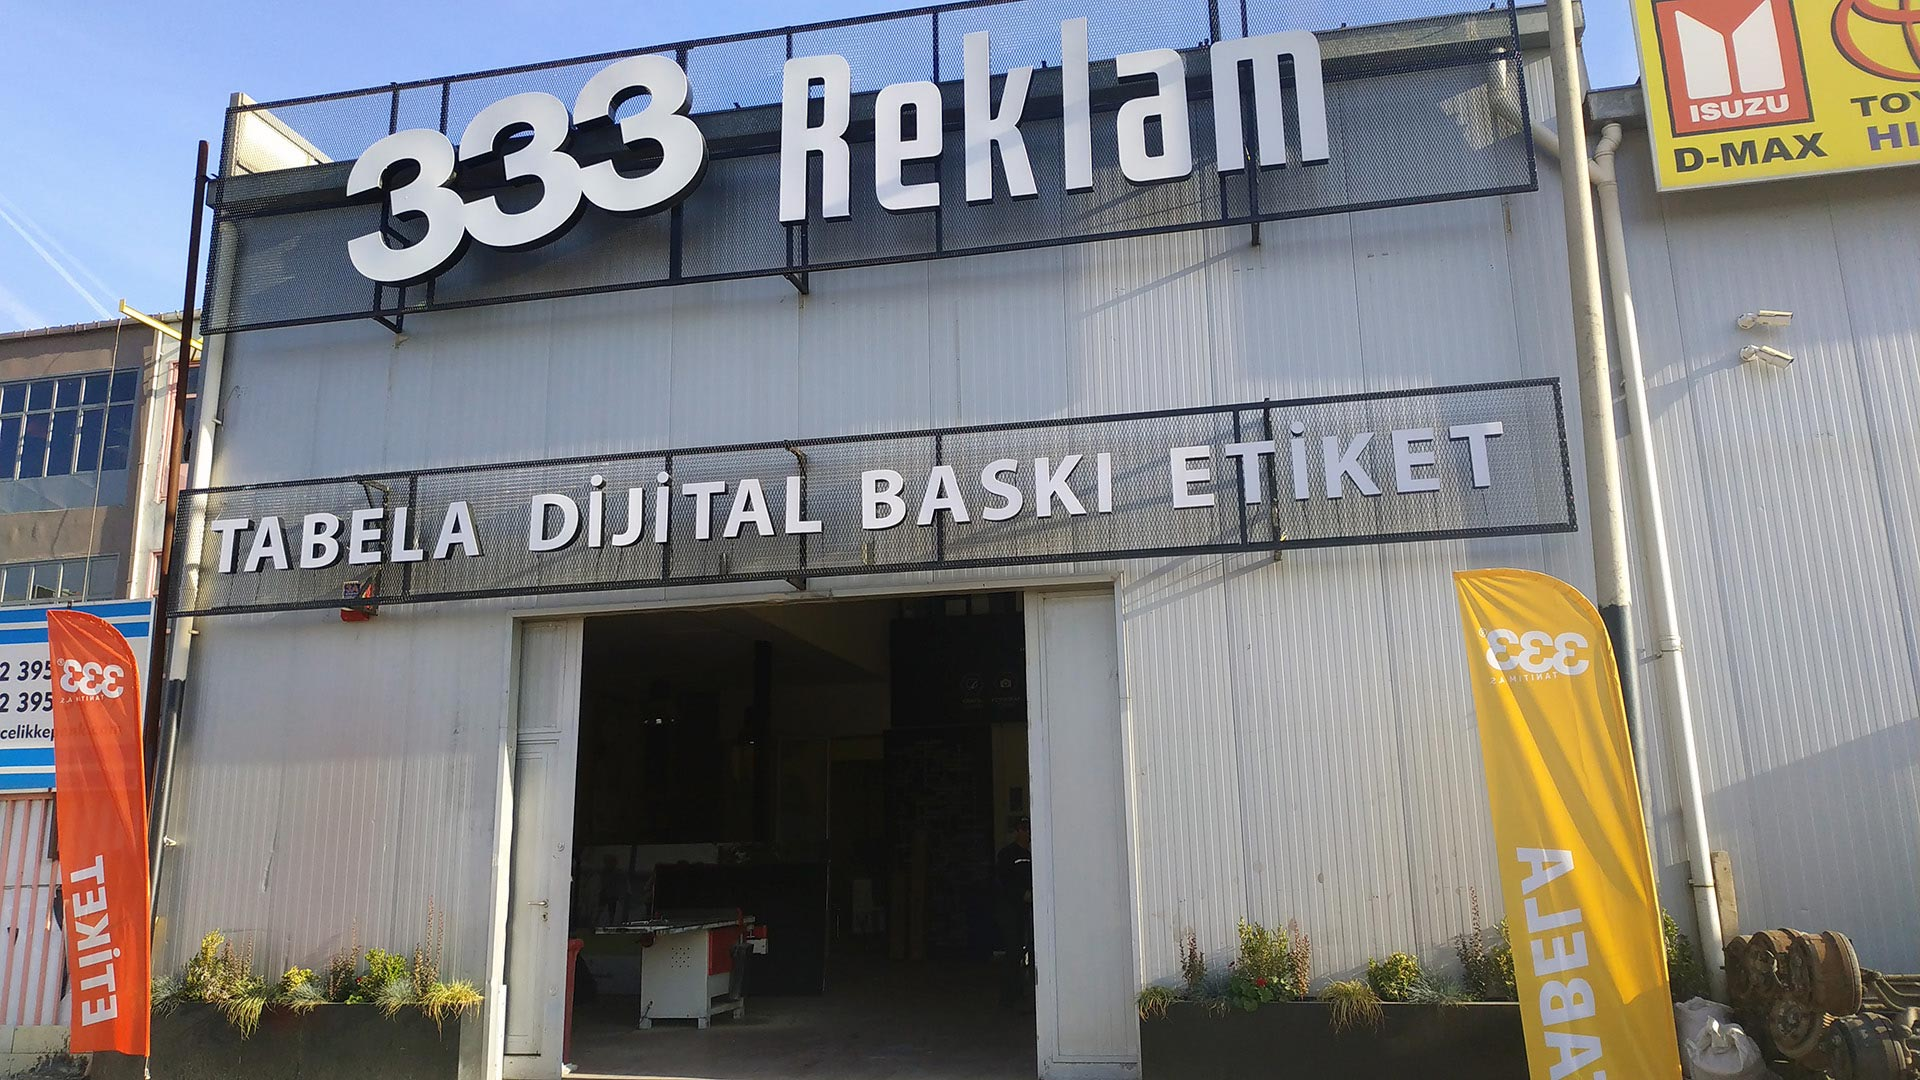 Tabela,Ankara,Tabelacı,333Reklam